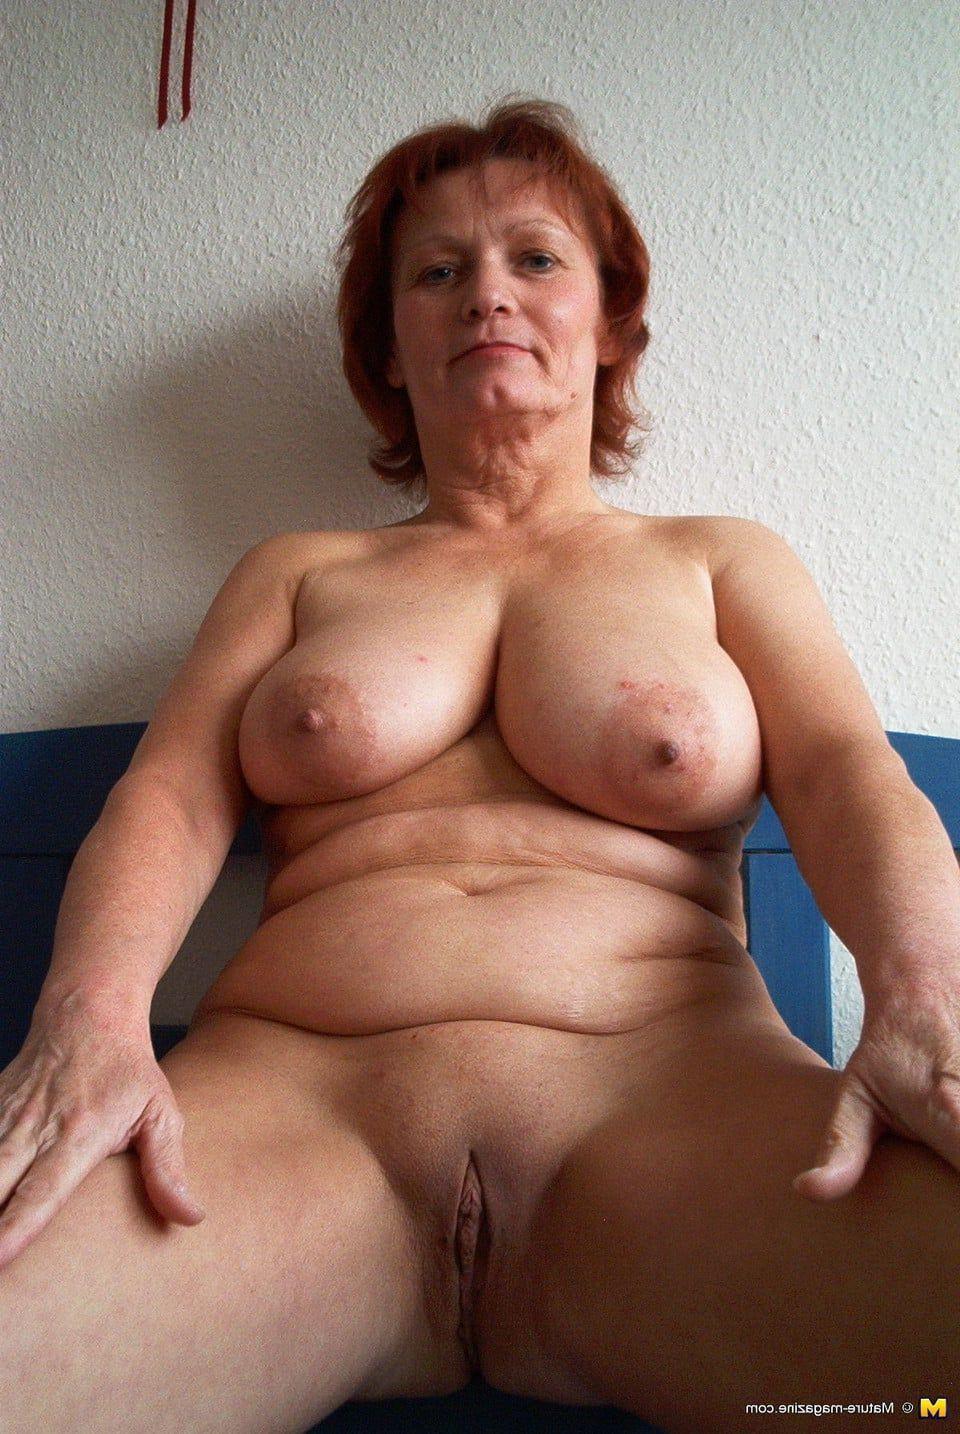 Jungle kinky sex videos